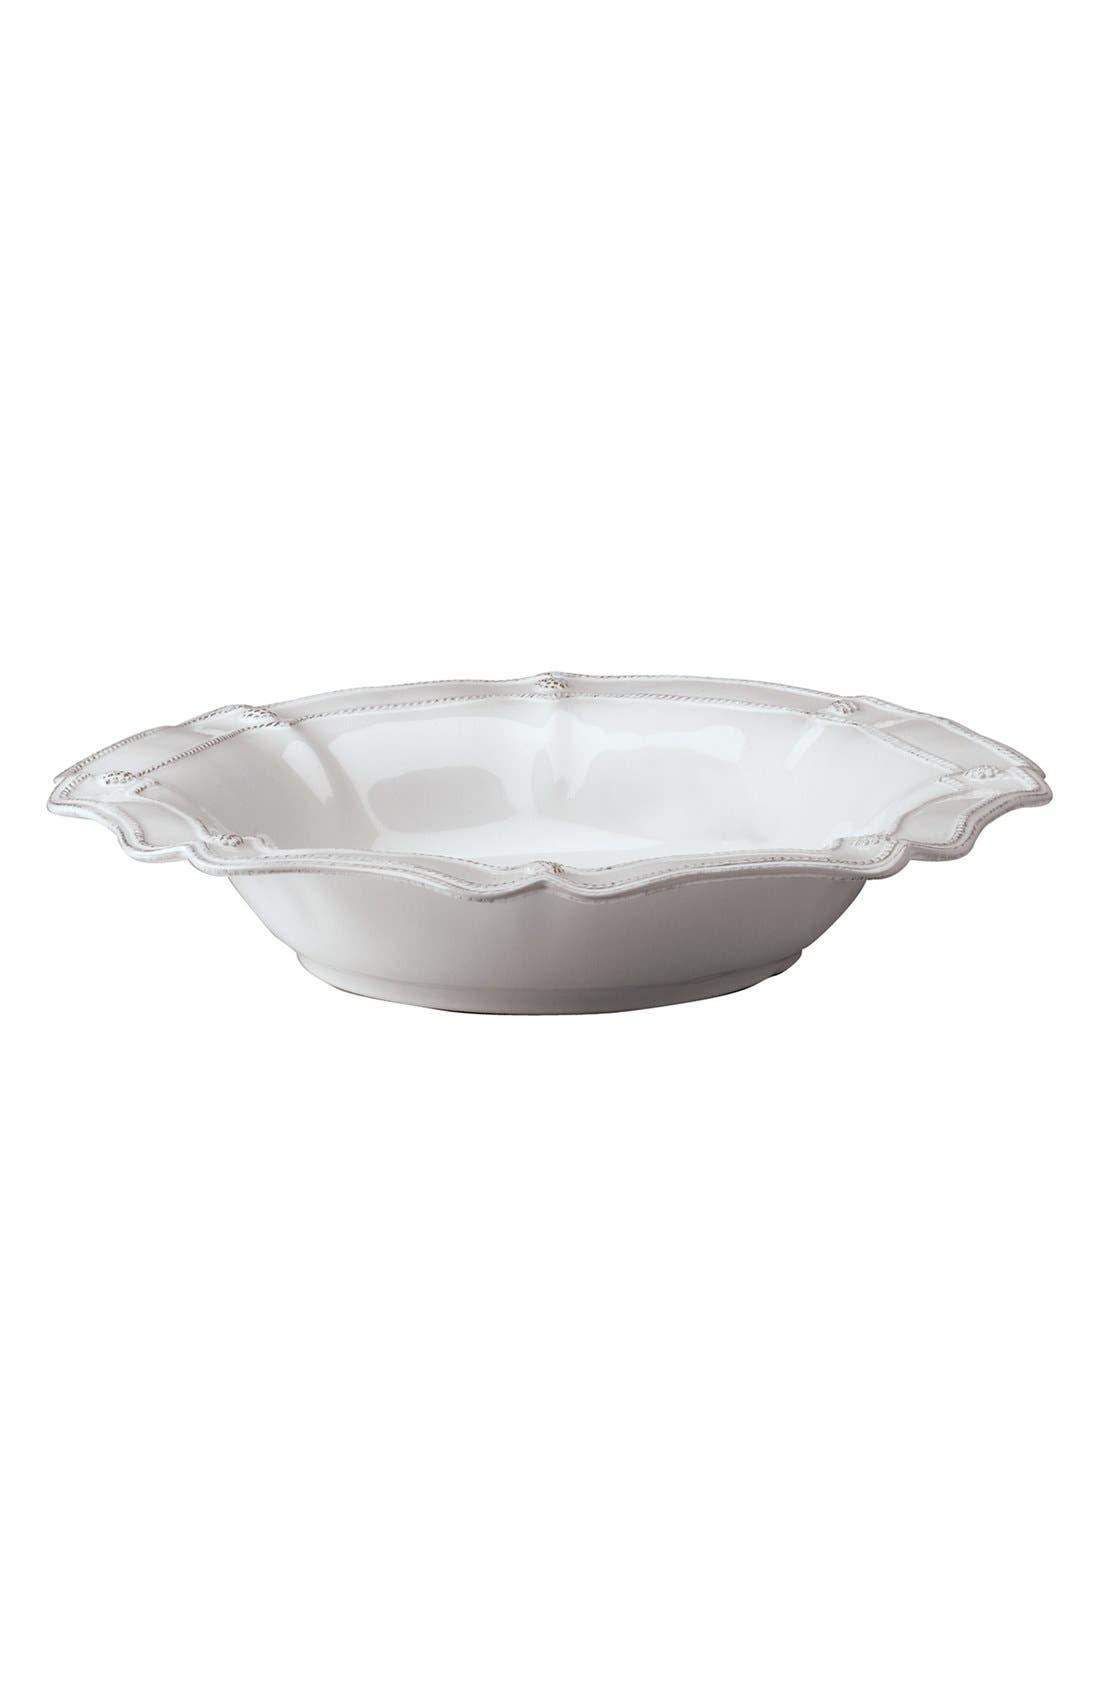 JULISKA 'Berry and Thread' Ceramic Serving Bowl